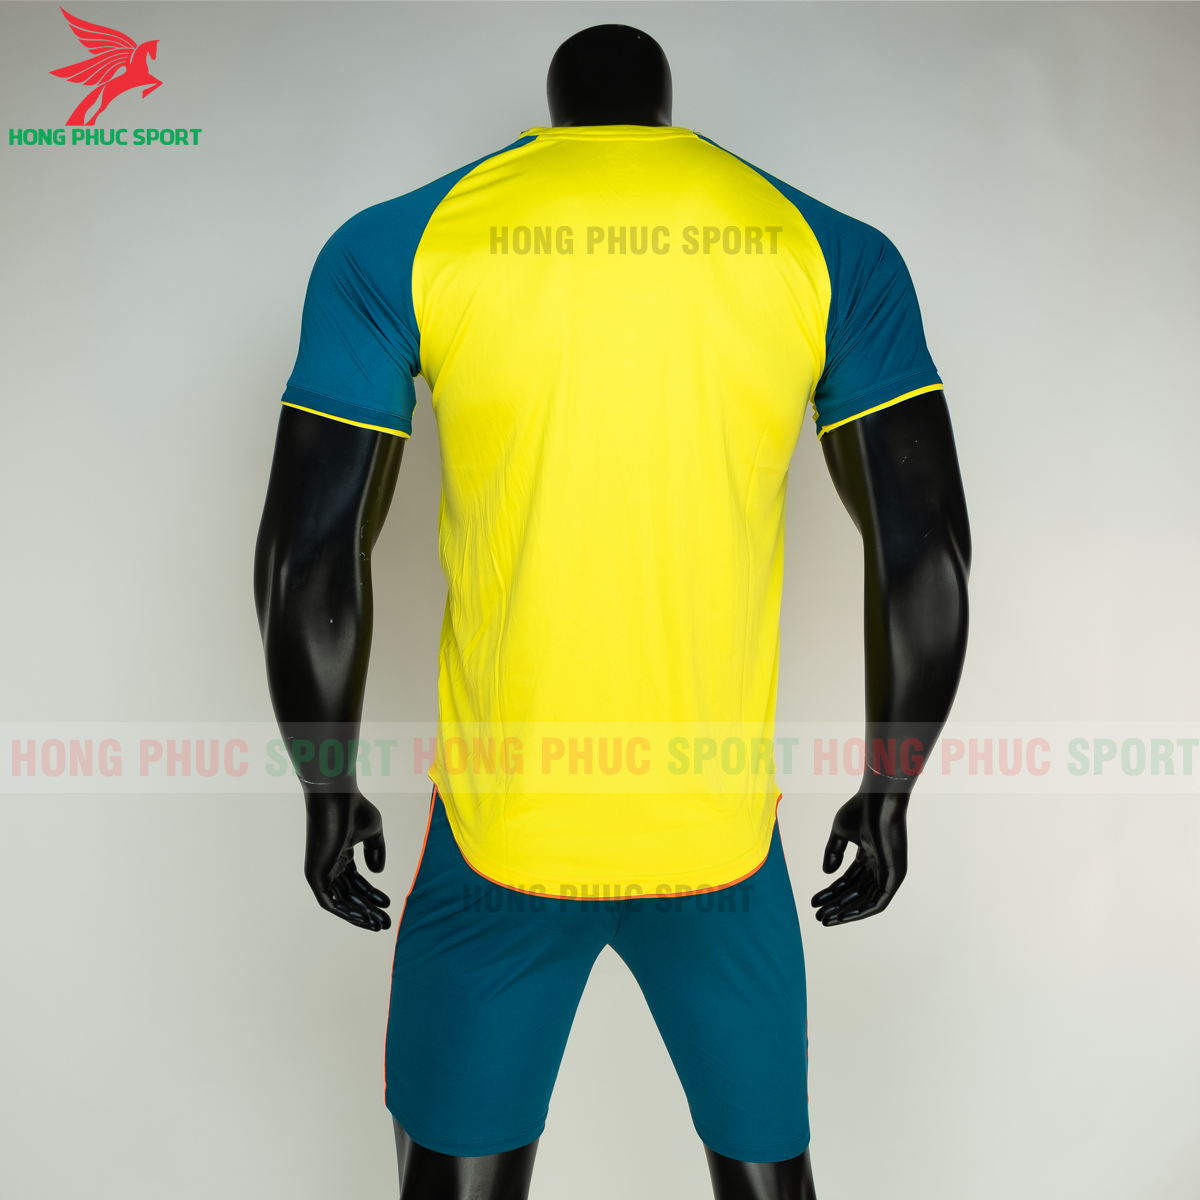 https://cdn.hongphucsport.com/unsafe/s4.shopbay.vn/files/285/ao-bong-da-khong-logo-riki-grambor-mau-vang-8-605061676c7c2.png